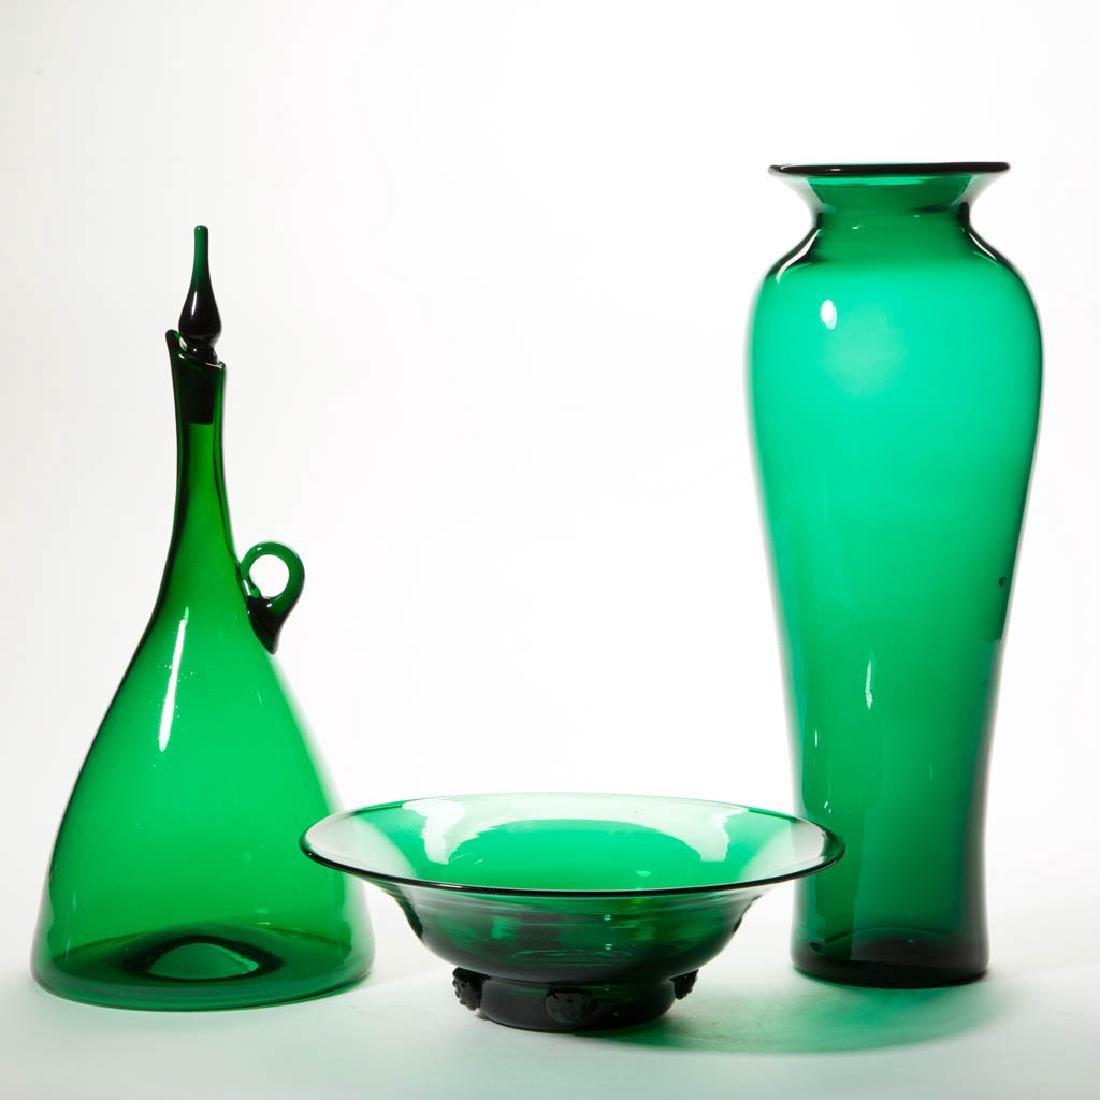 BLENKO EMERALD GREEN GLASS ARTICLES, LOT OF THREE